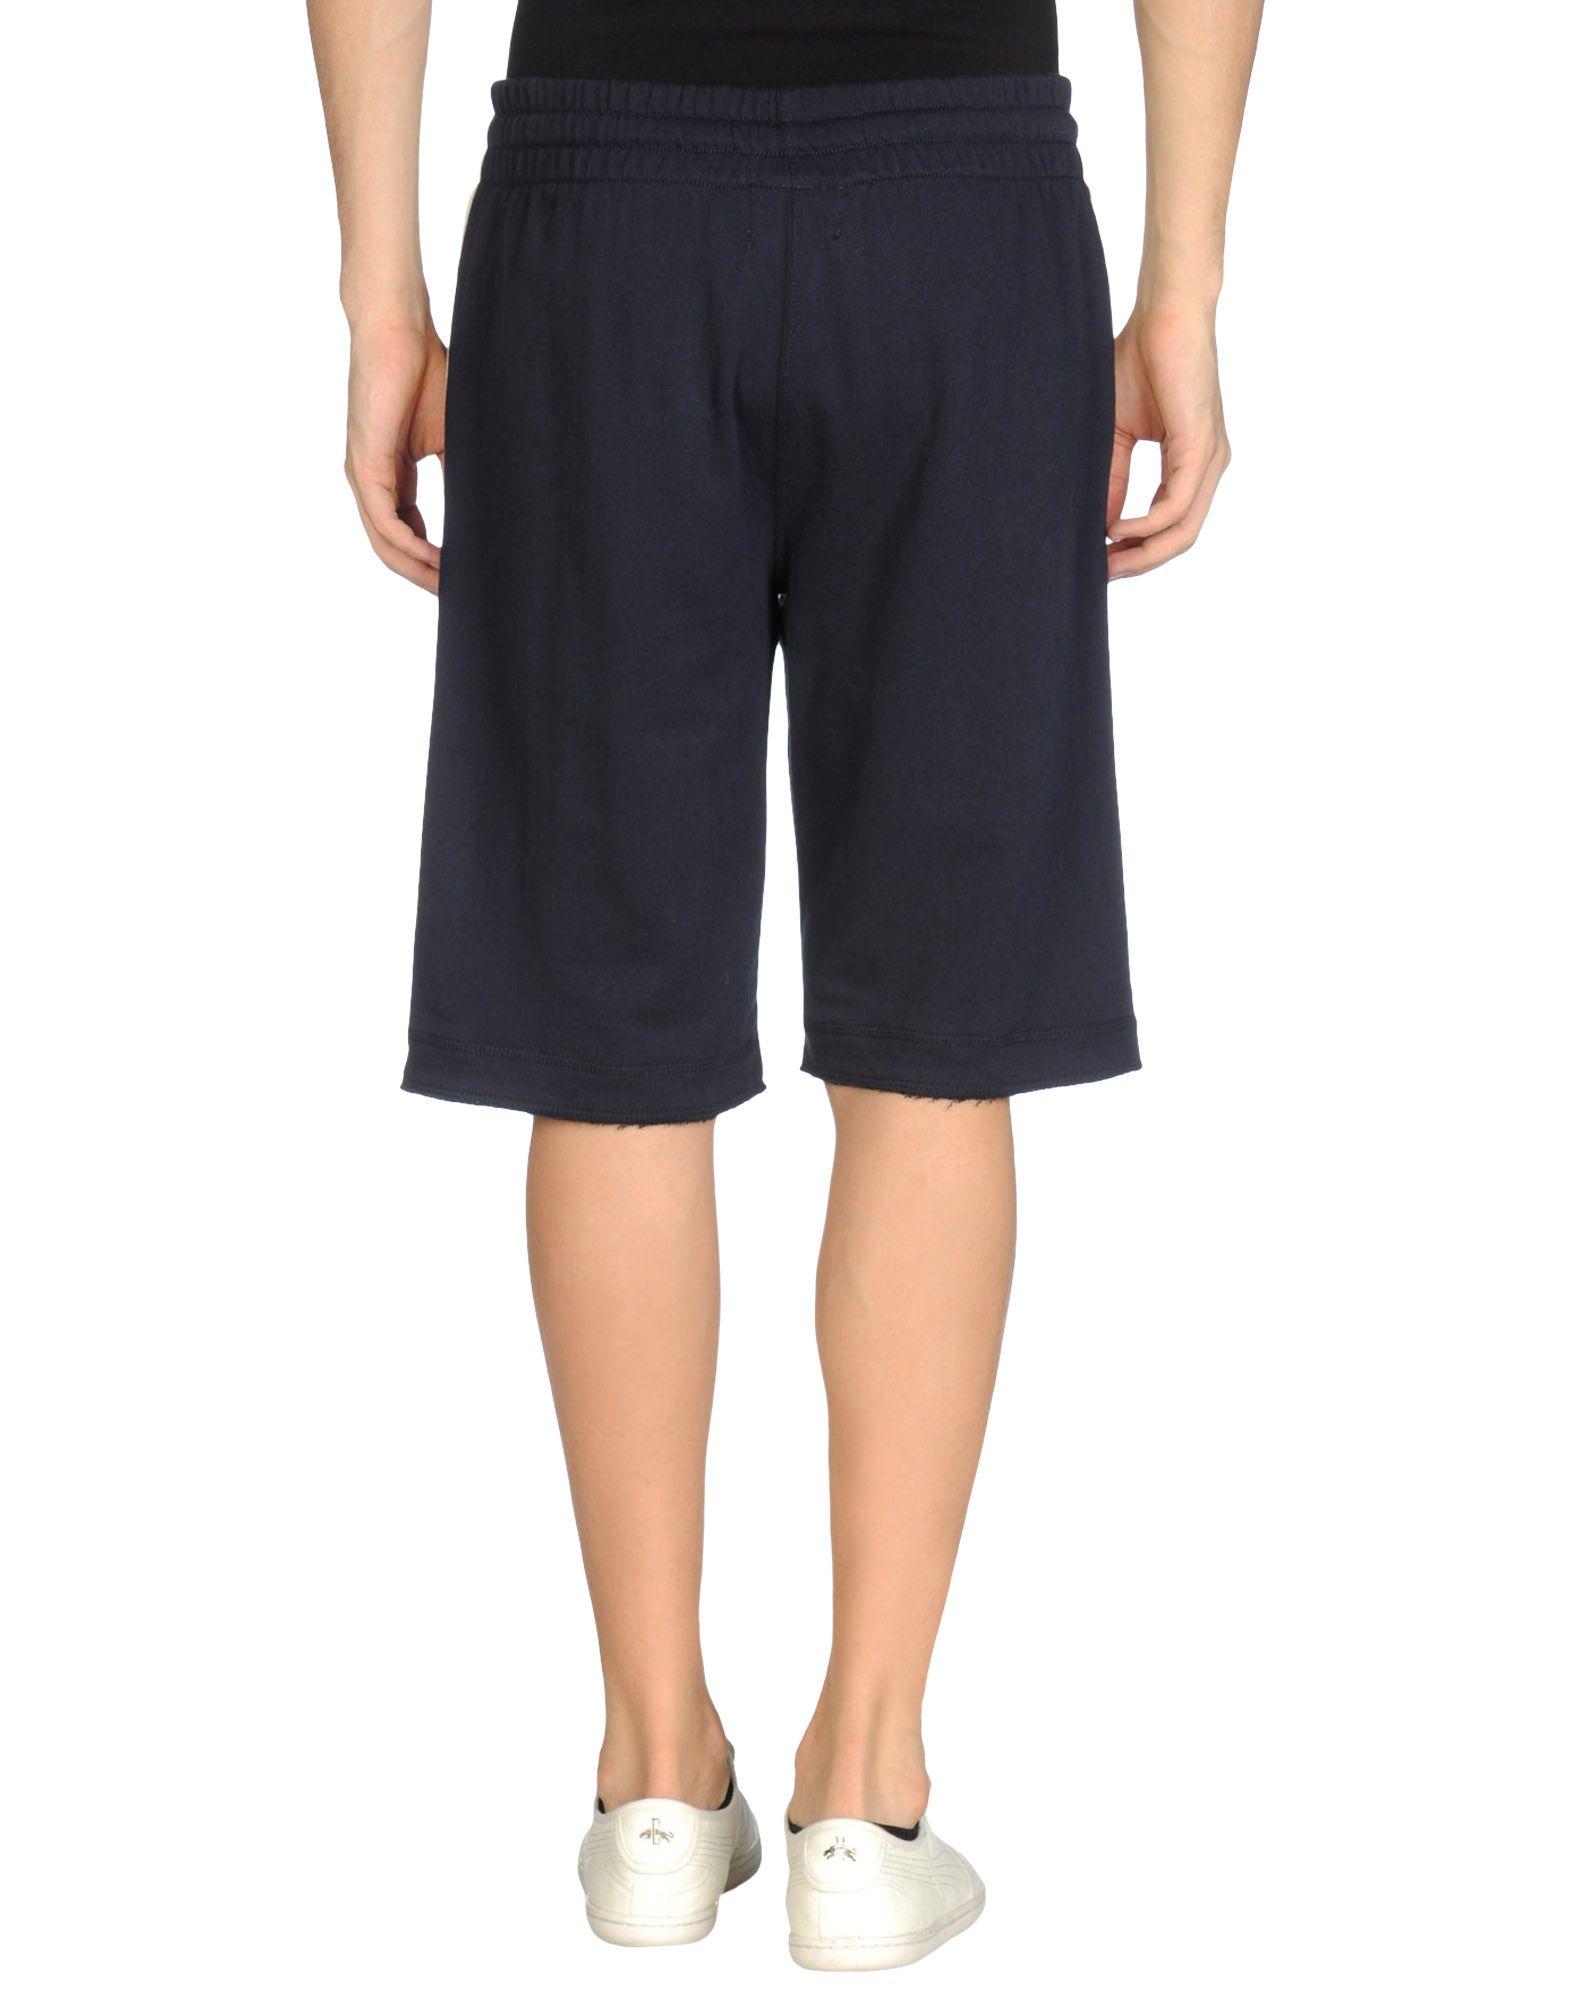 Lyst - Converse Sweat Shorts in Blue for Men 92810a54387e